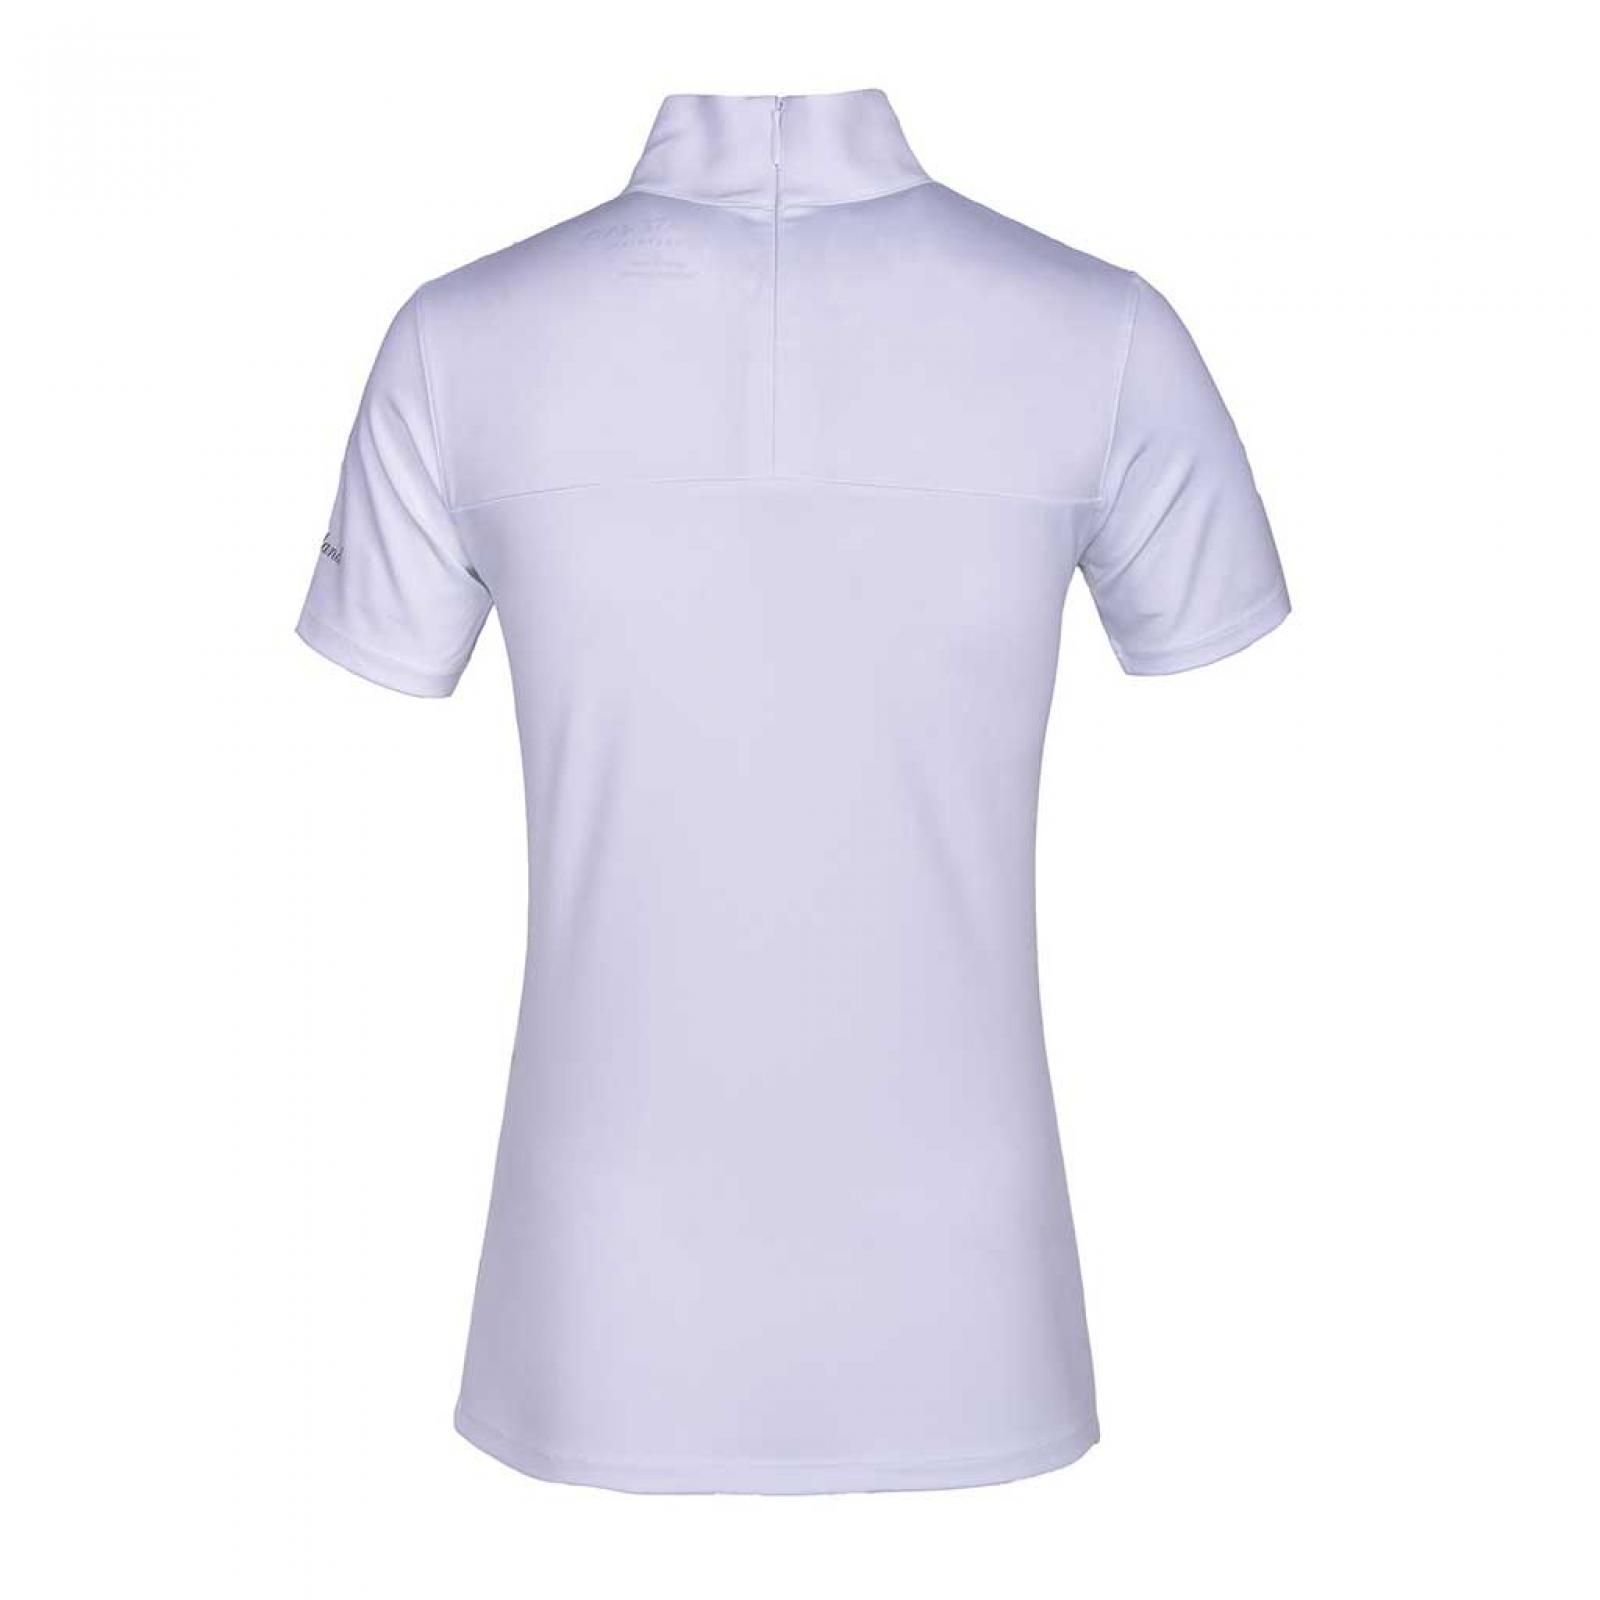 Kingsland Janna White Show Shirt